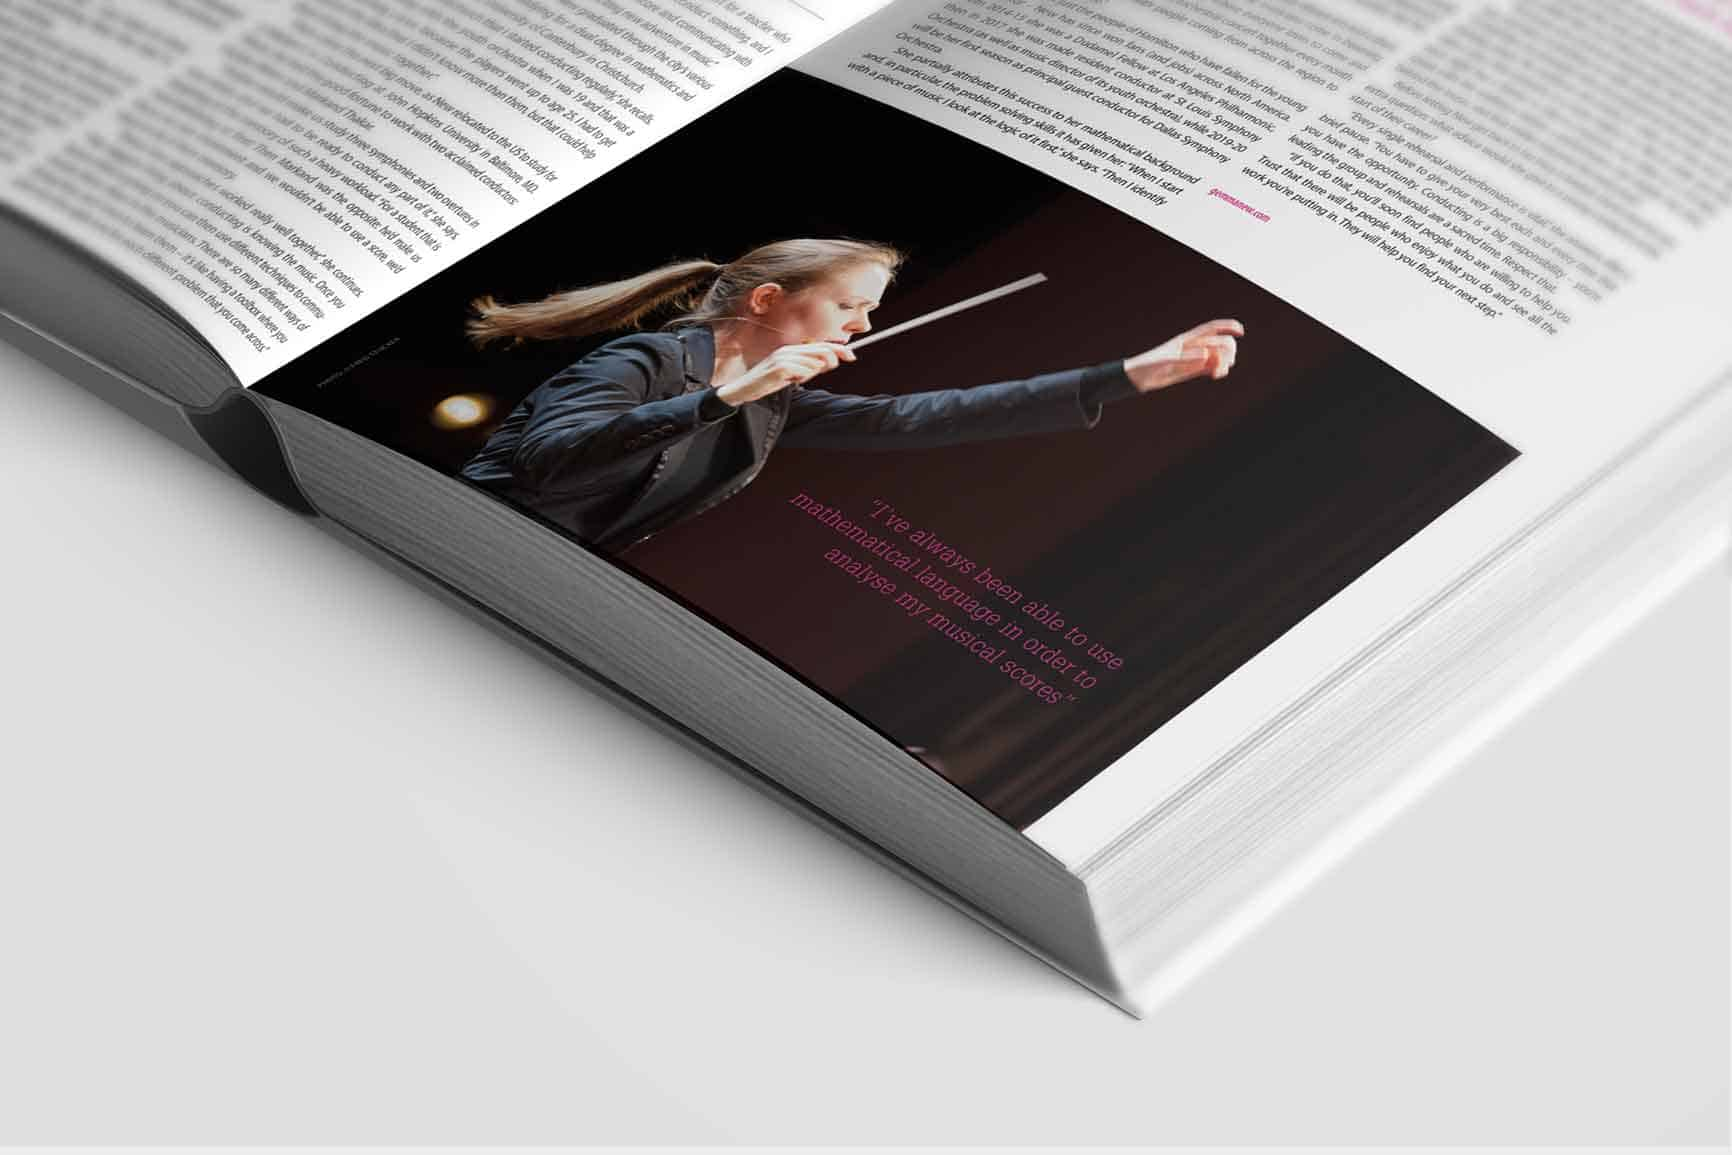 Gemma Conductor